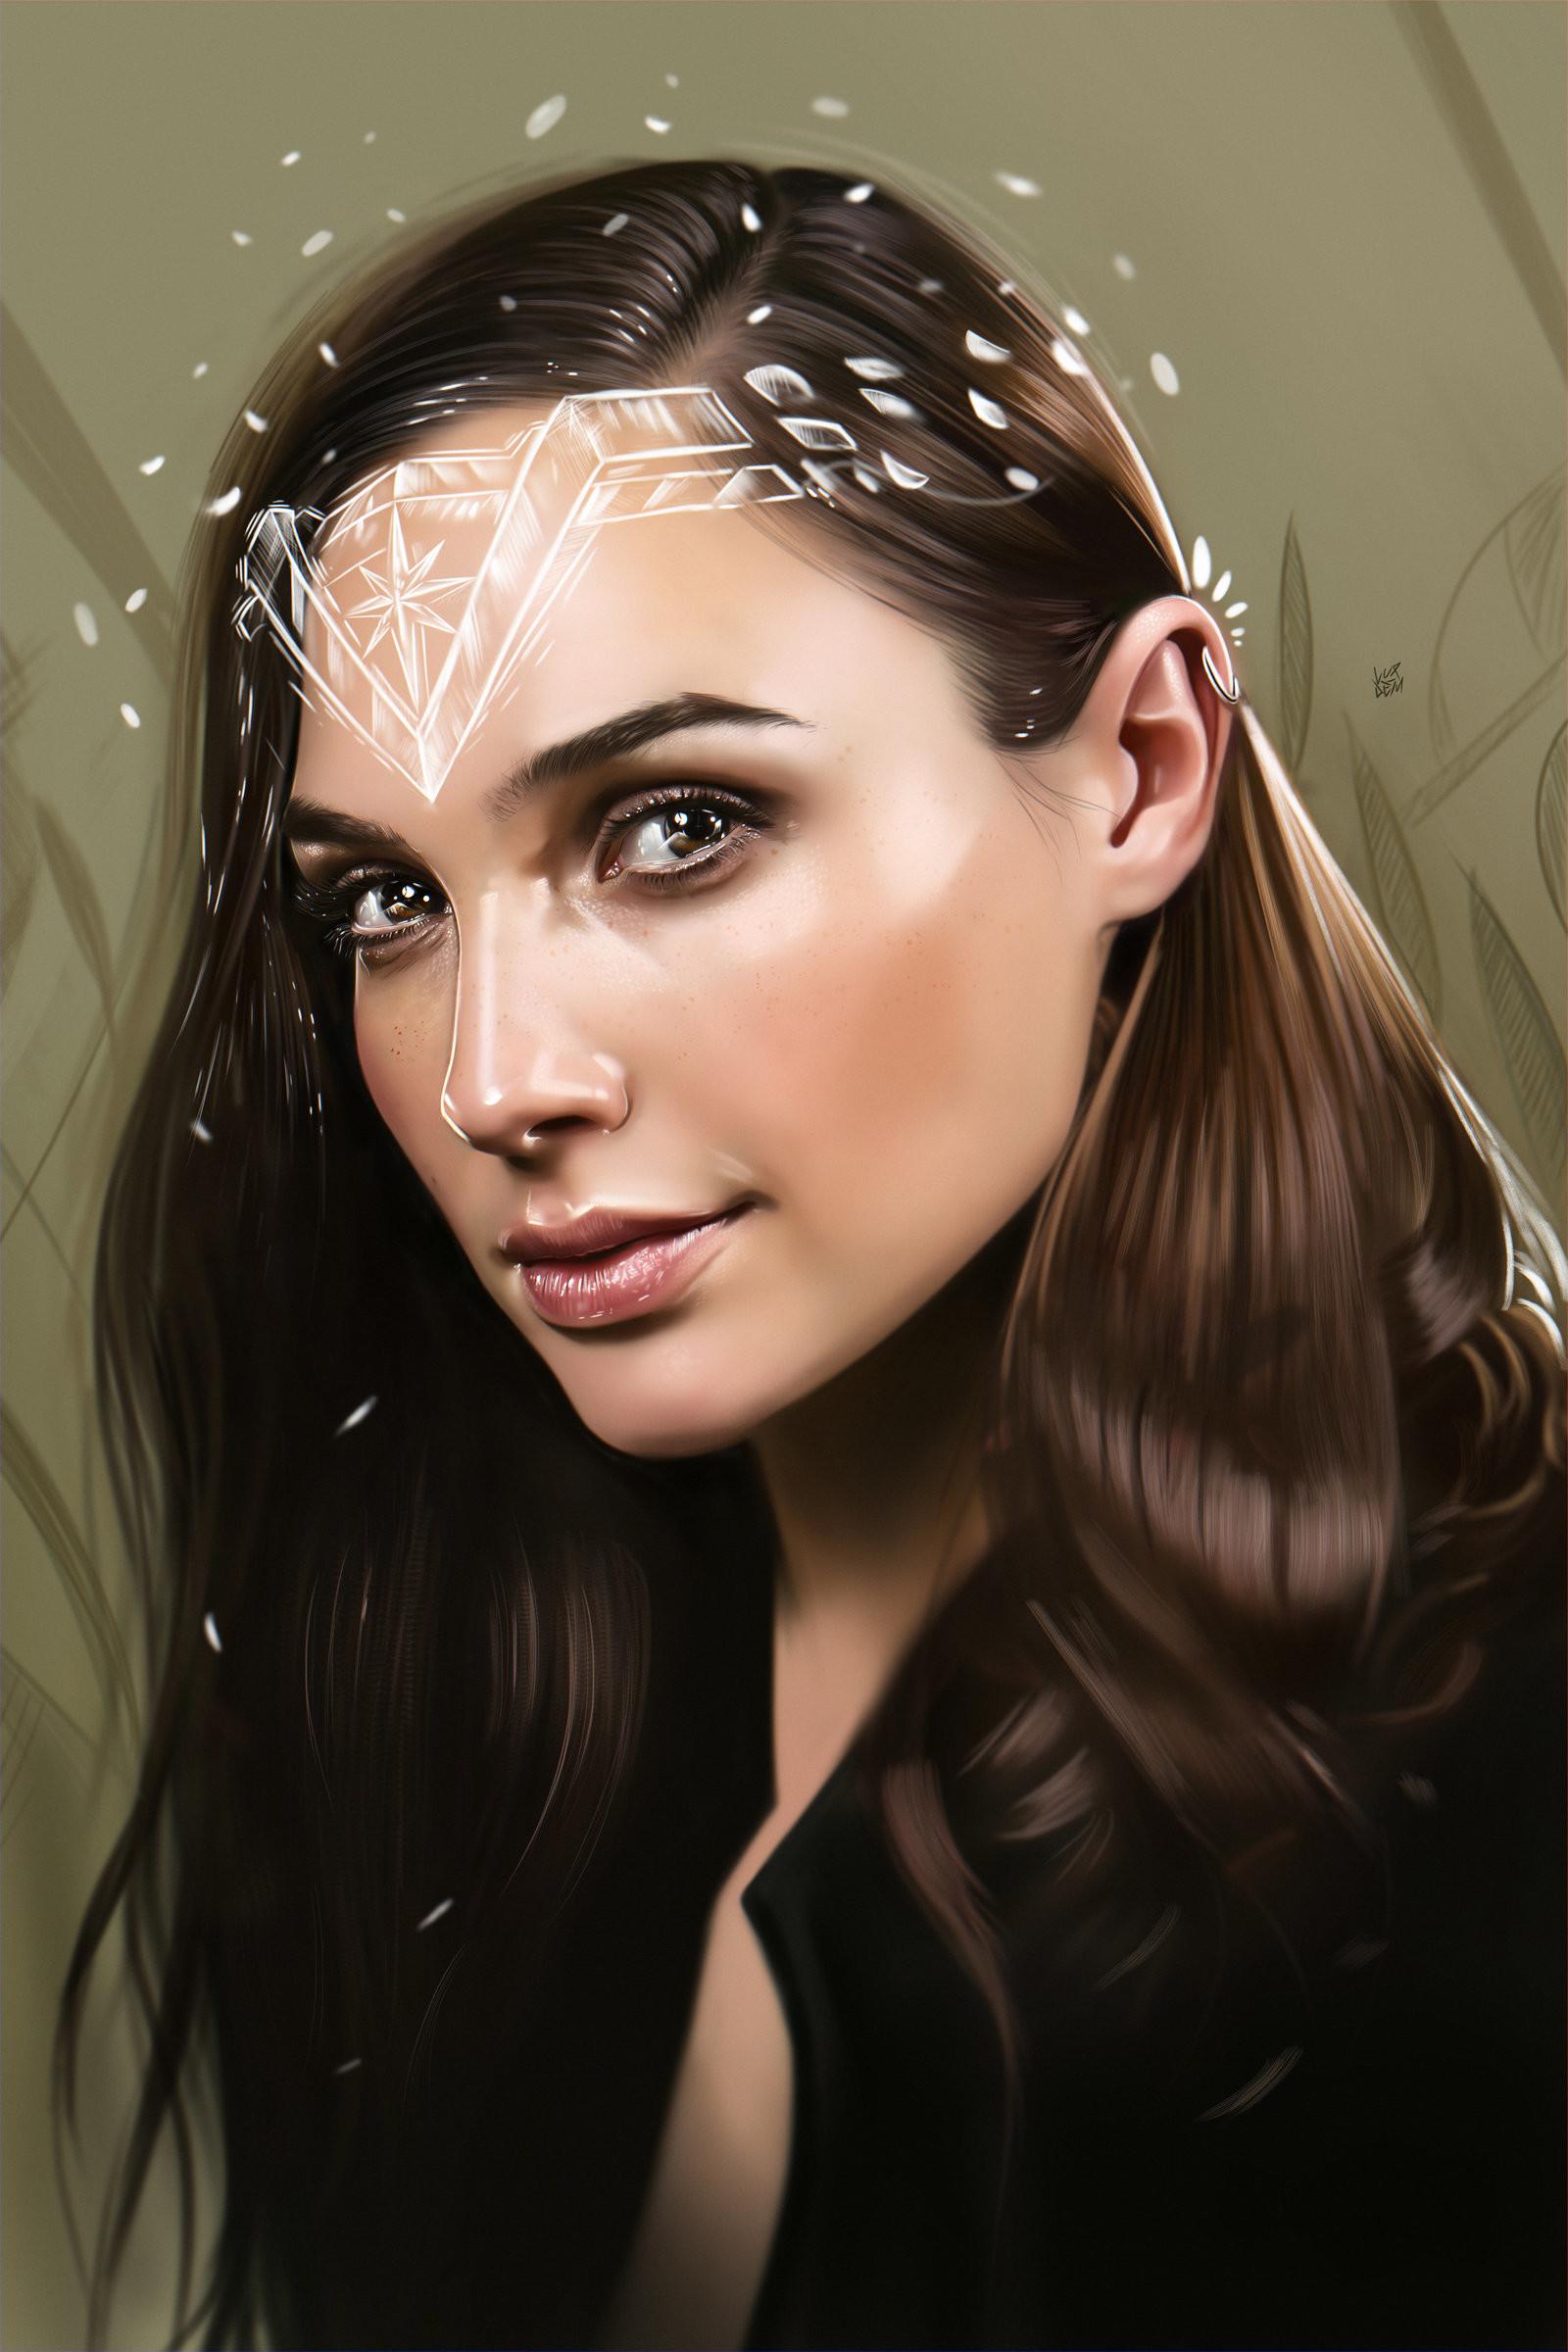 Yasar vurdem gal gadot wonder woman illustration by vurdem dbg5hfv